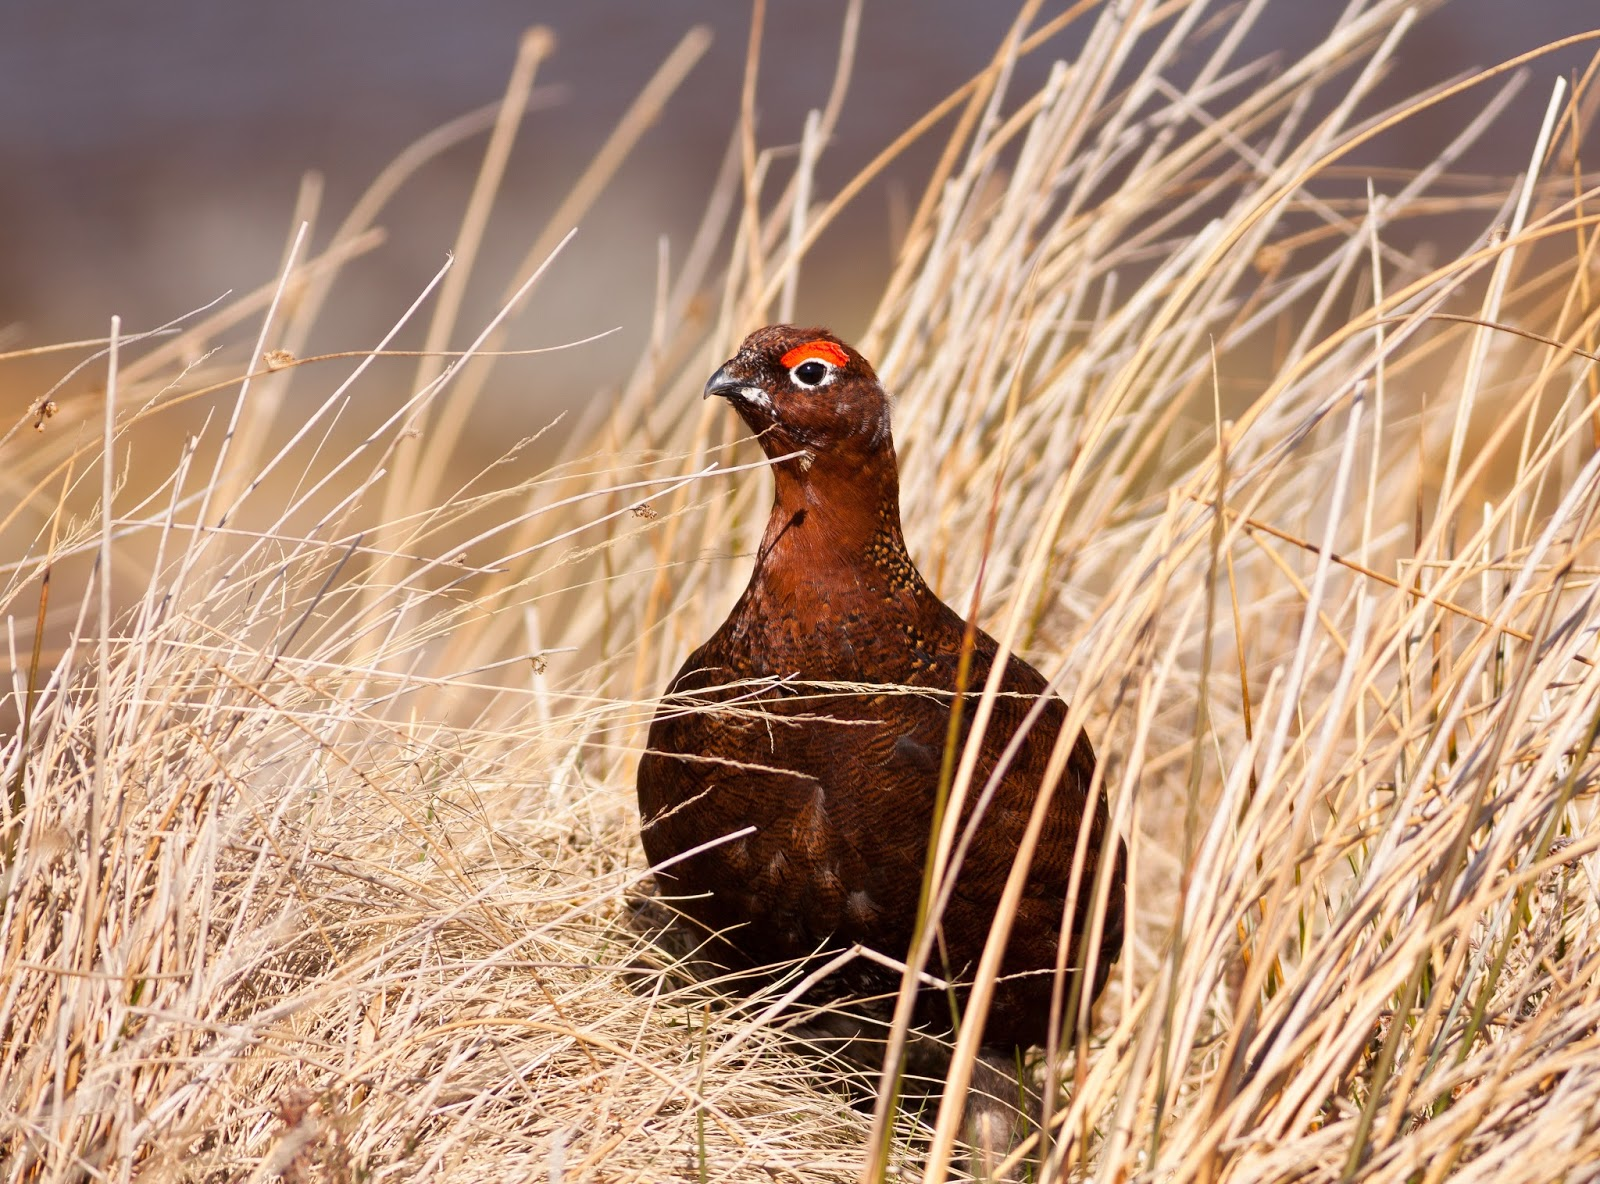 Red Grouse - Lochindorb, Scotland